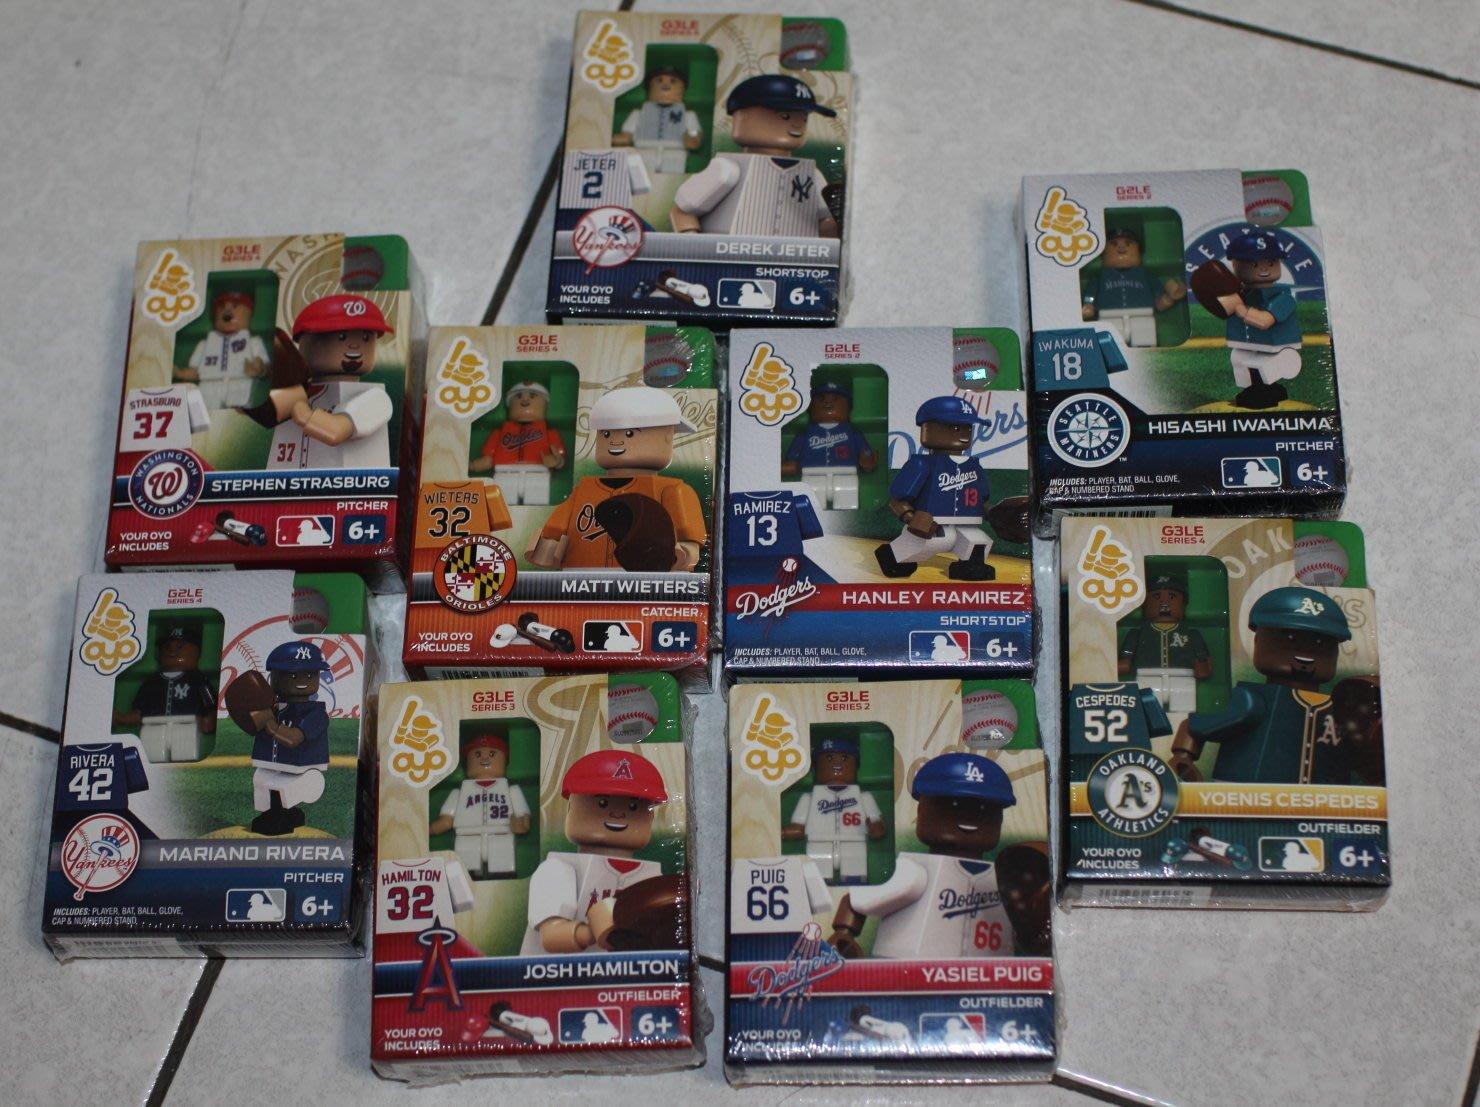 【巨砲猛男 PRO SHOP】MLB X LEGO 樂高 現貨區